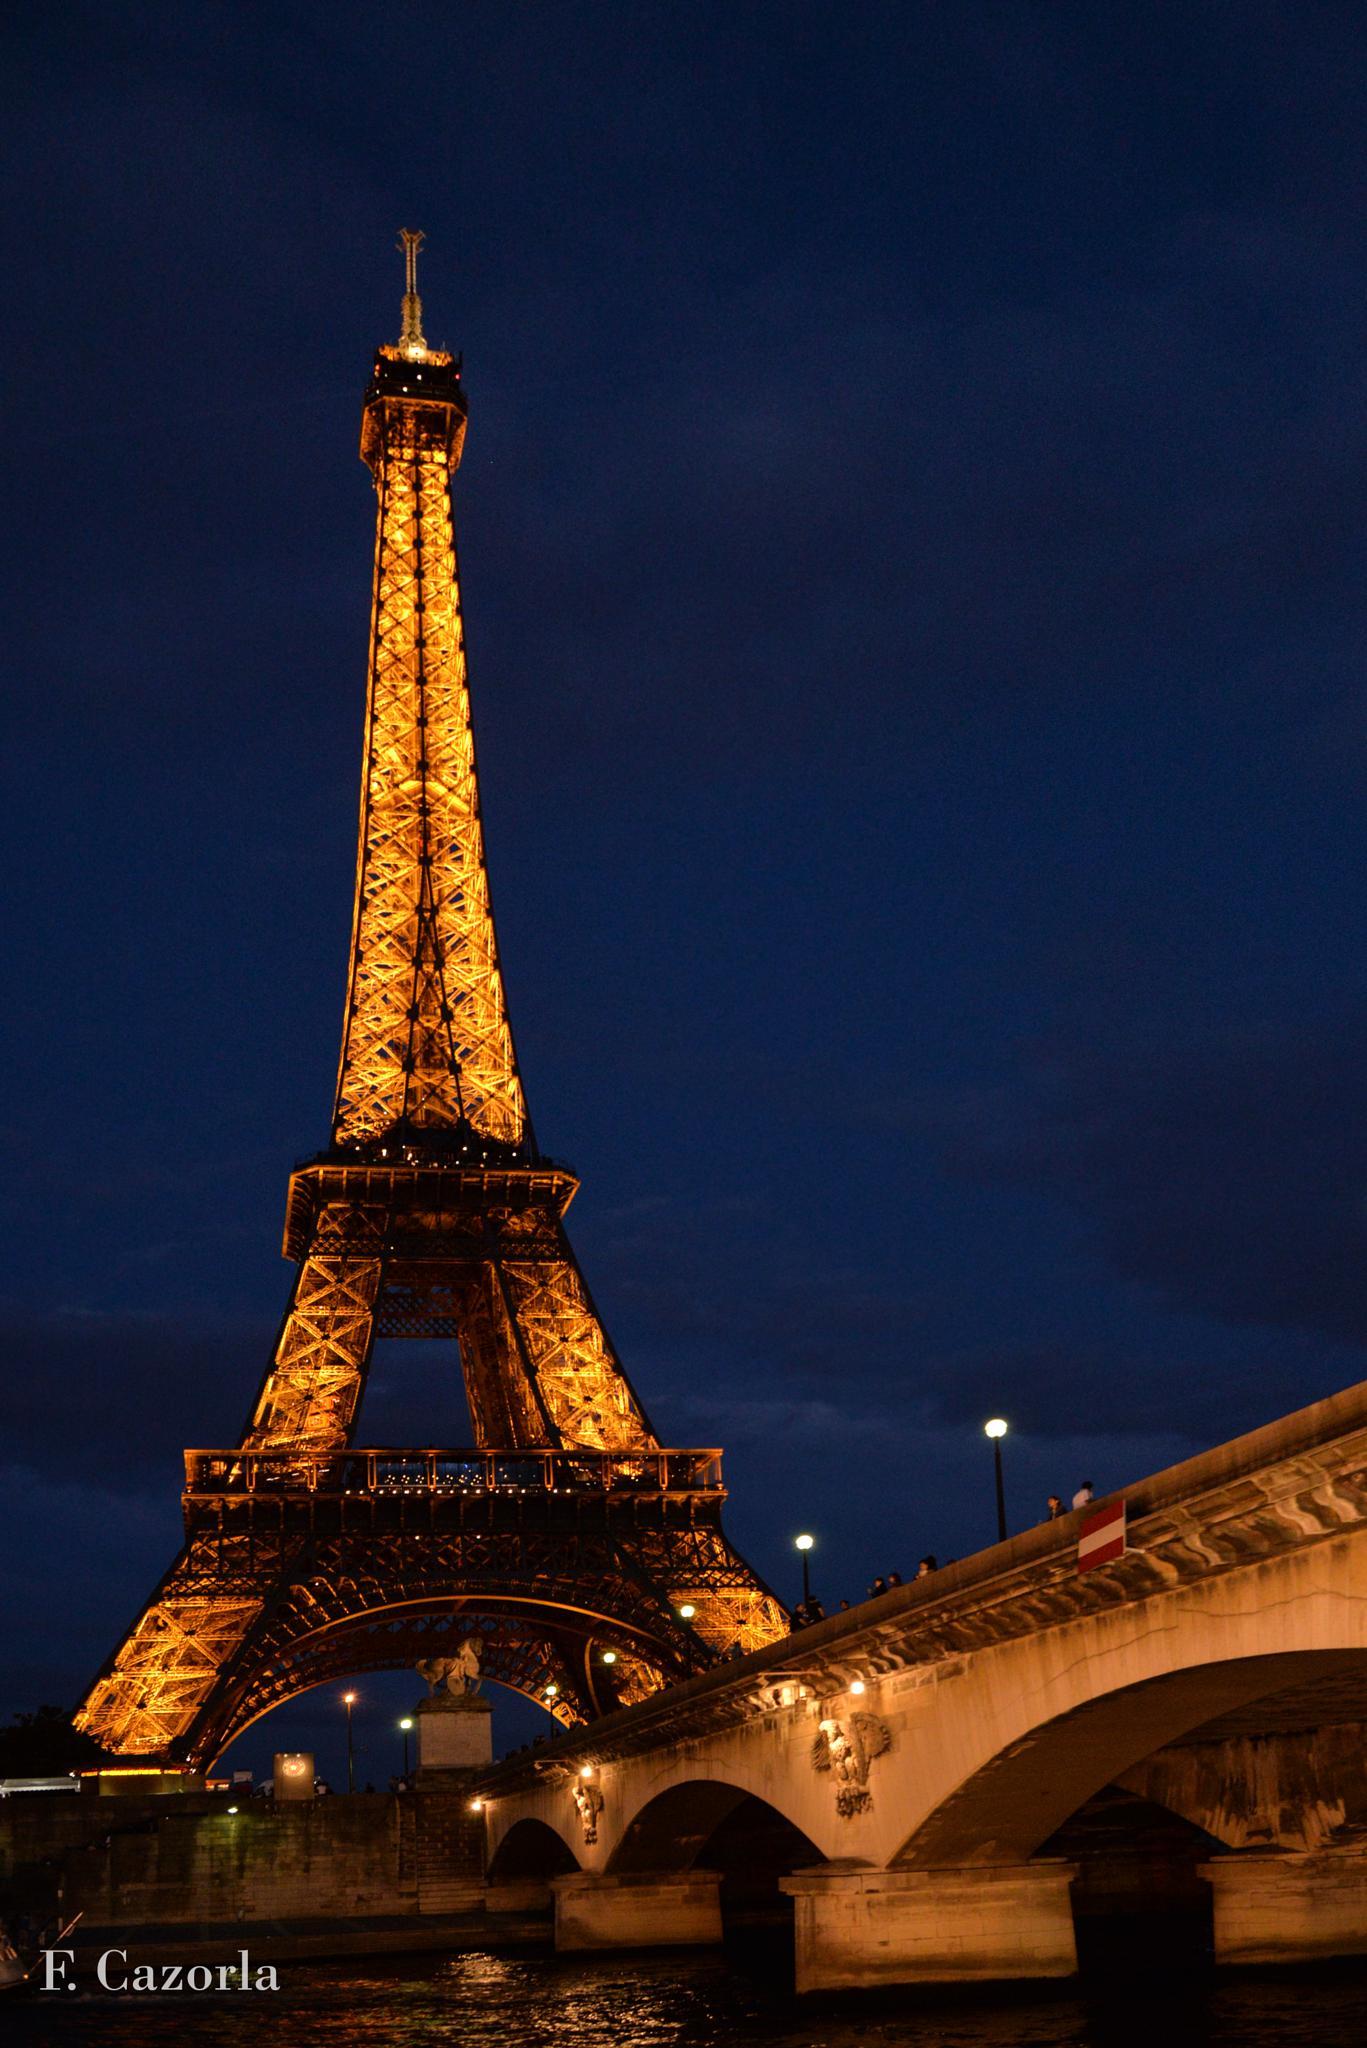 Torre Eiffel by Félix Cazorla